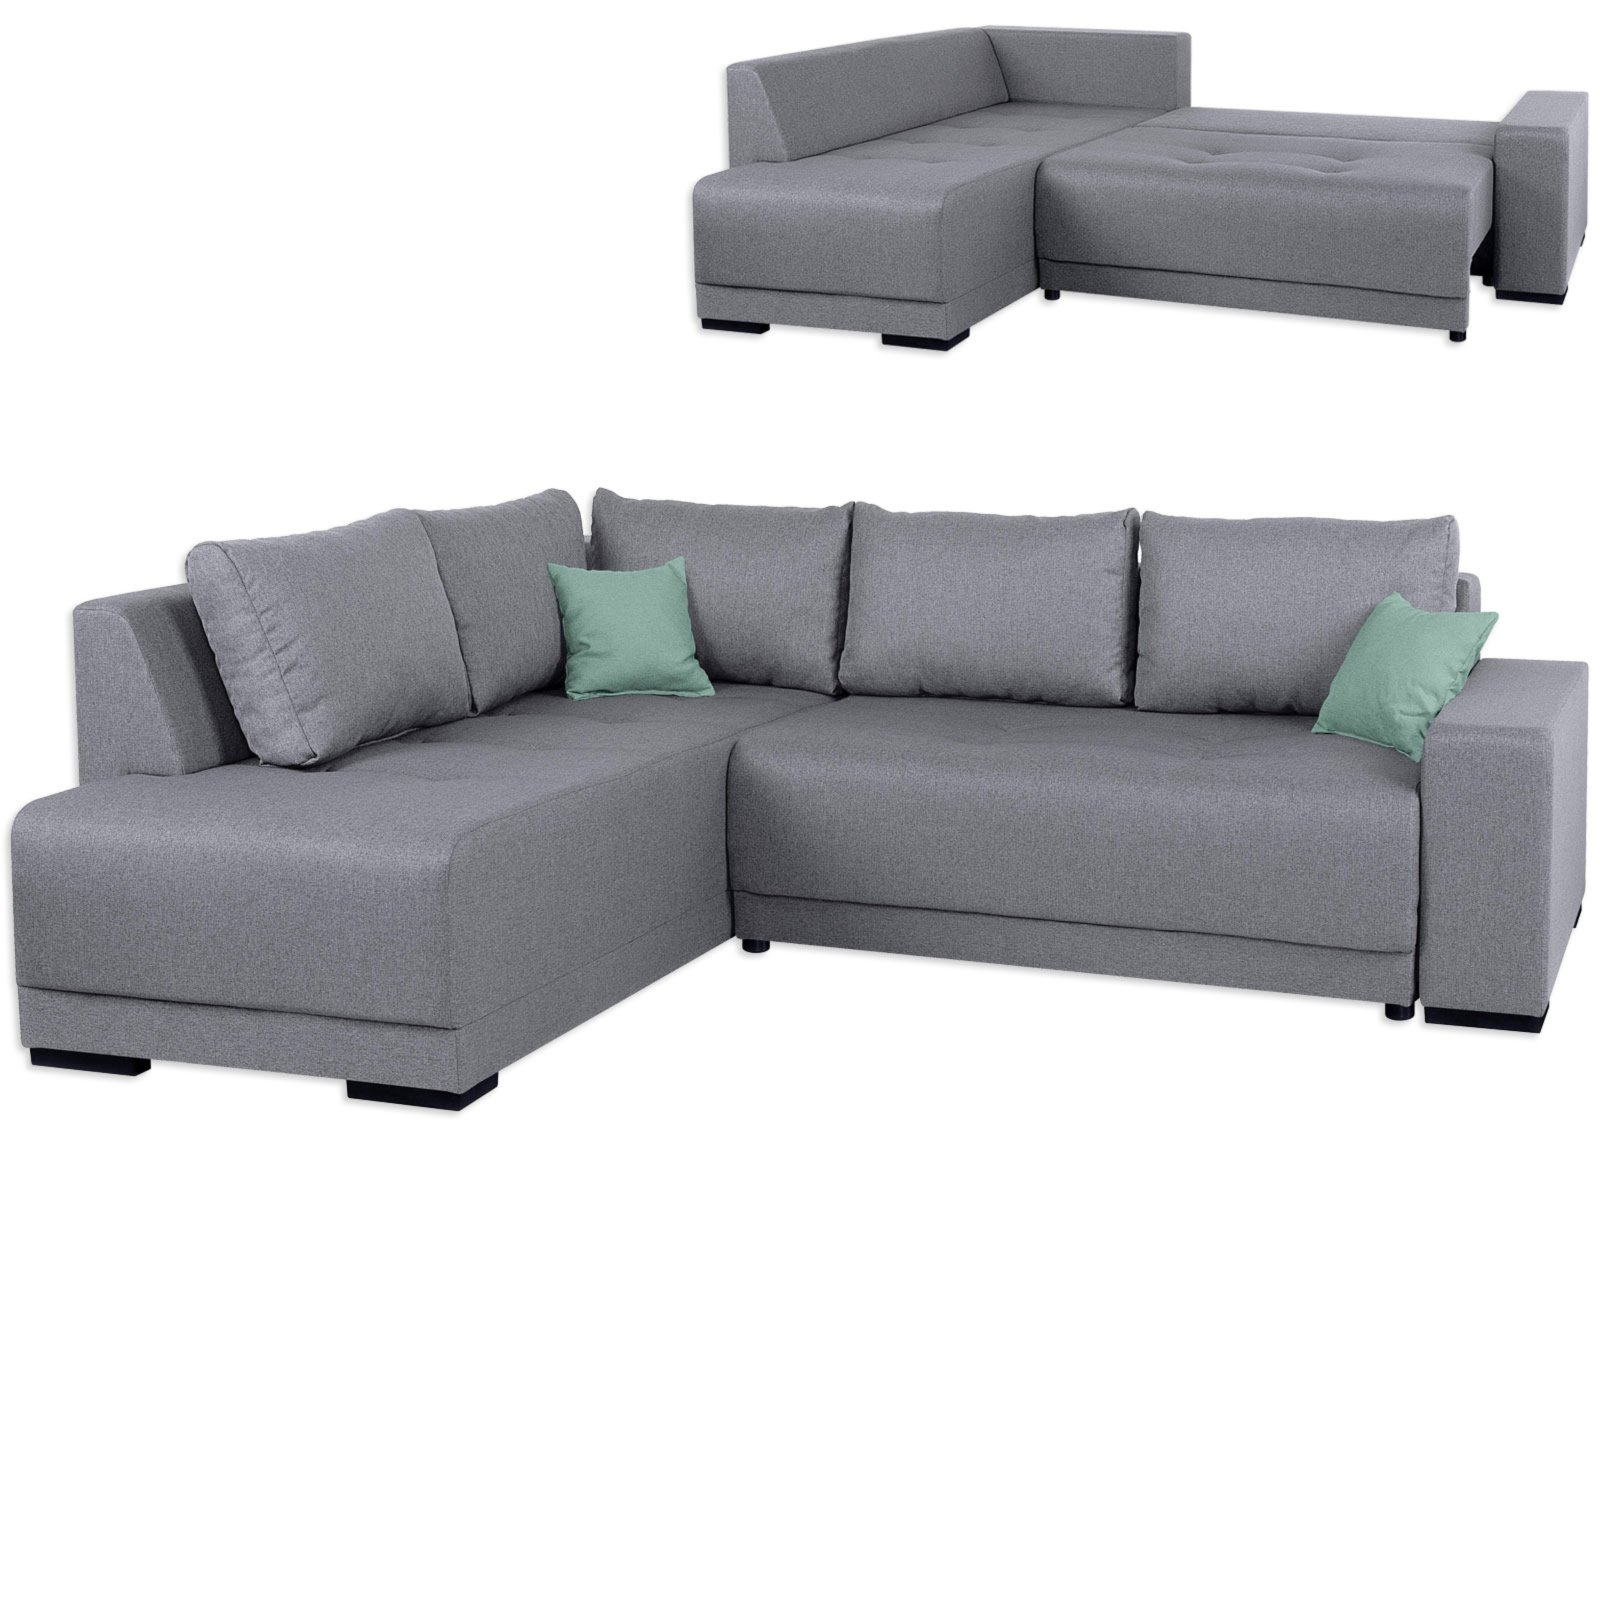 ecksofa grau boxspringfederung beidseitig montierbar ecksofas l form sofas couches. Black Bedroom Furniture Sets. Home Design Ideas